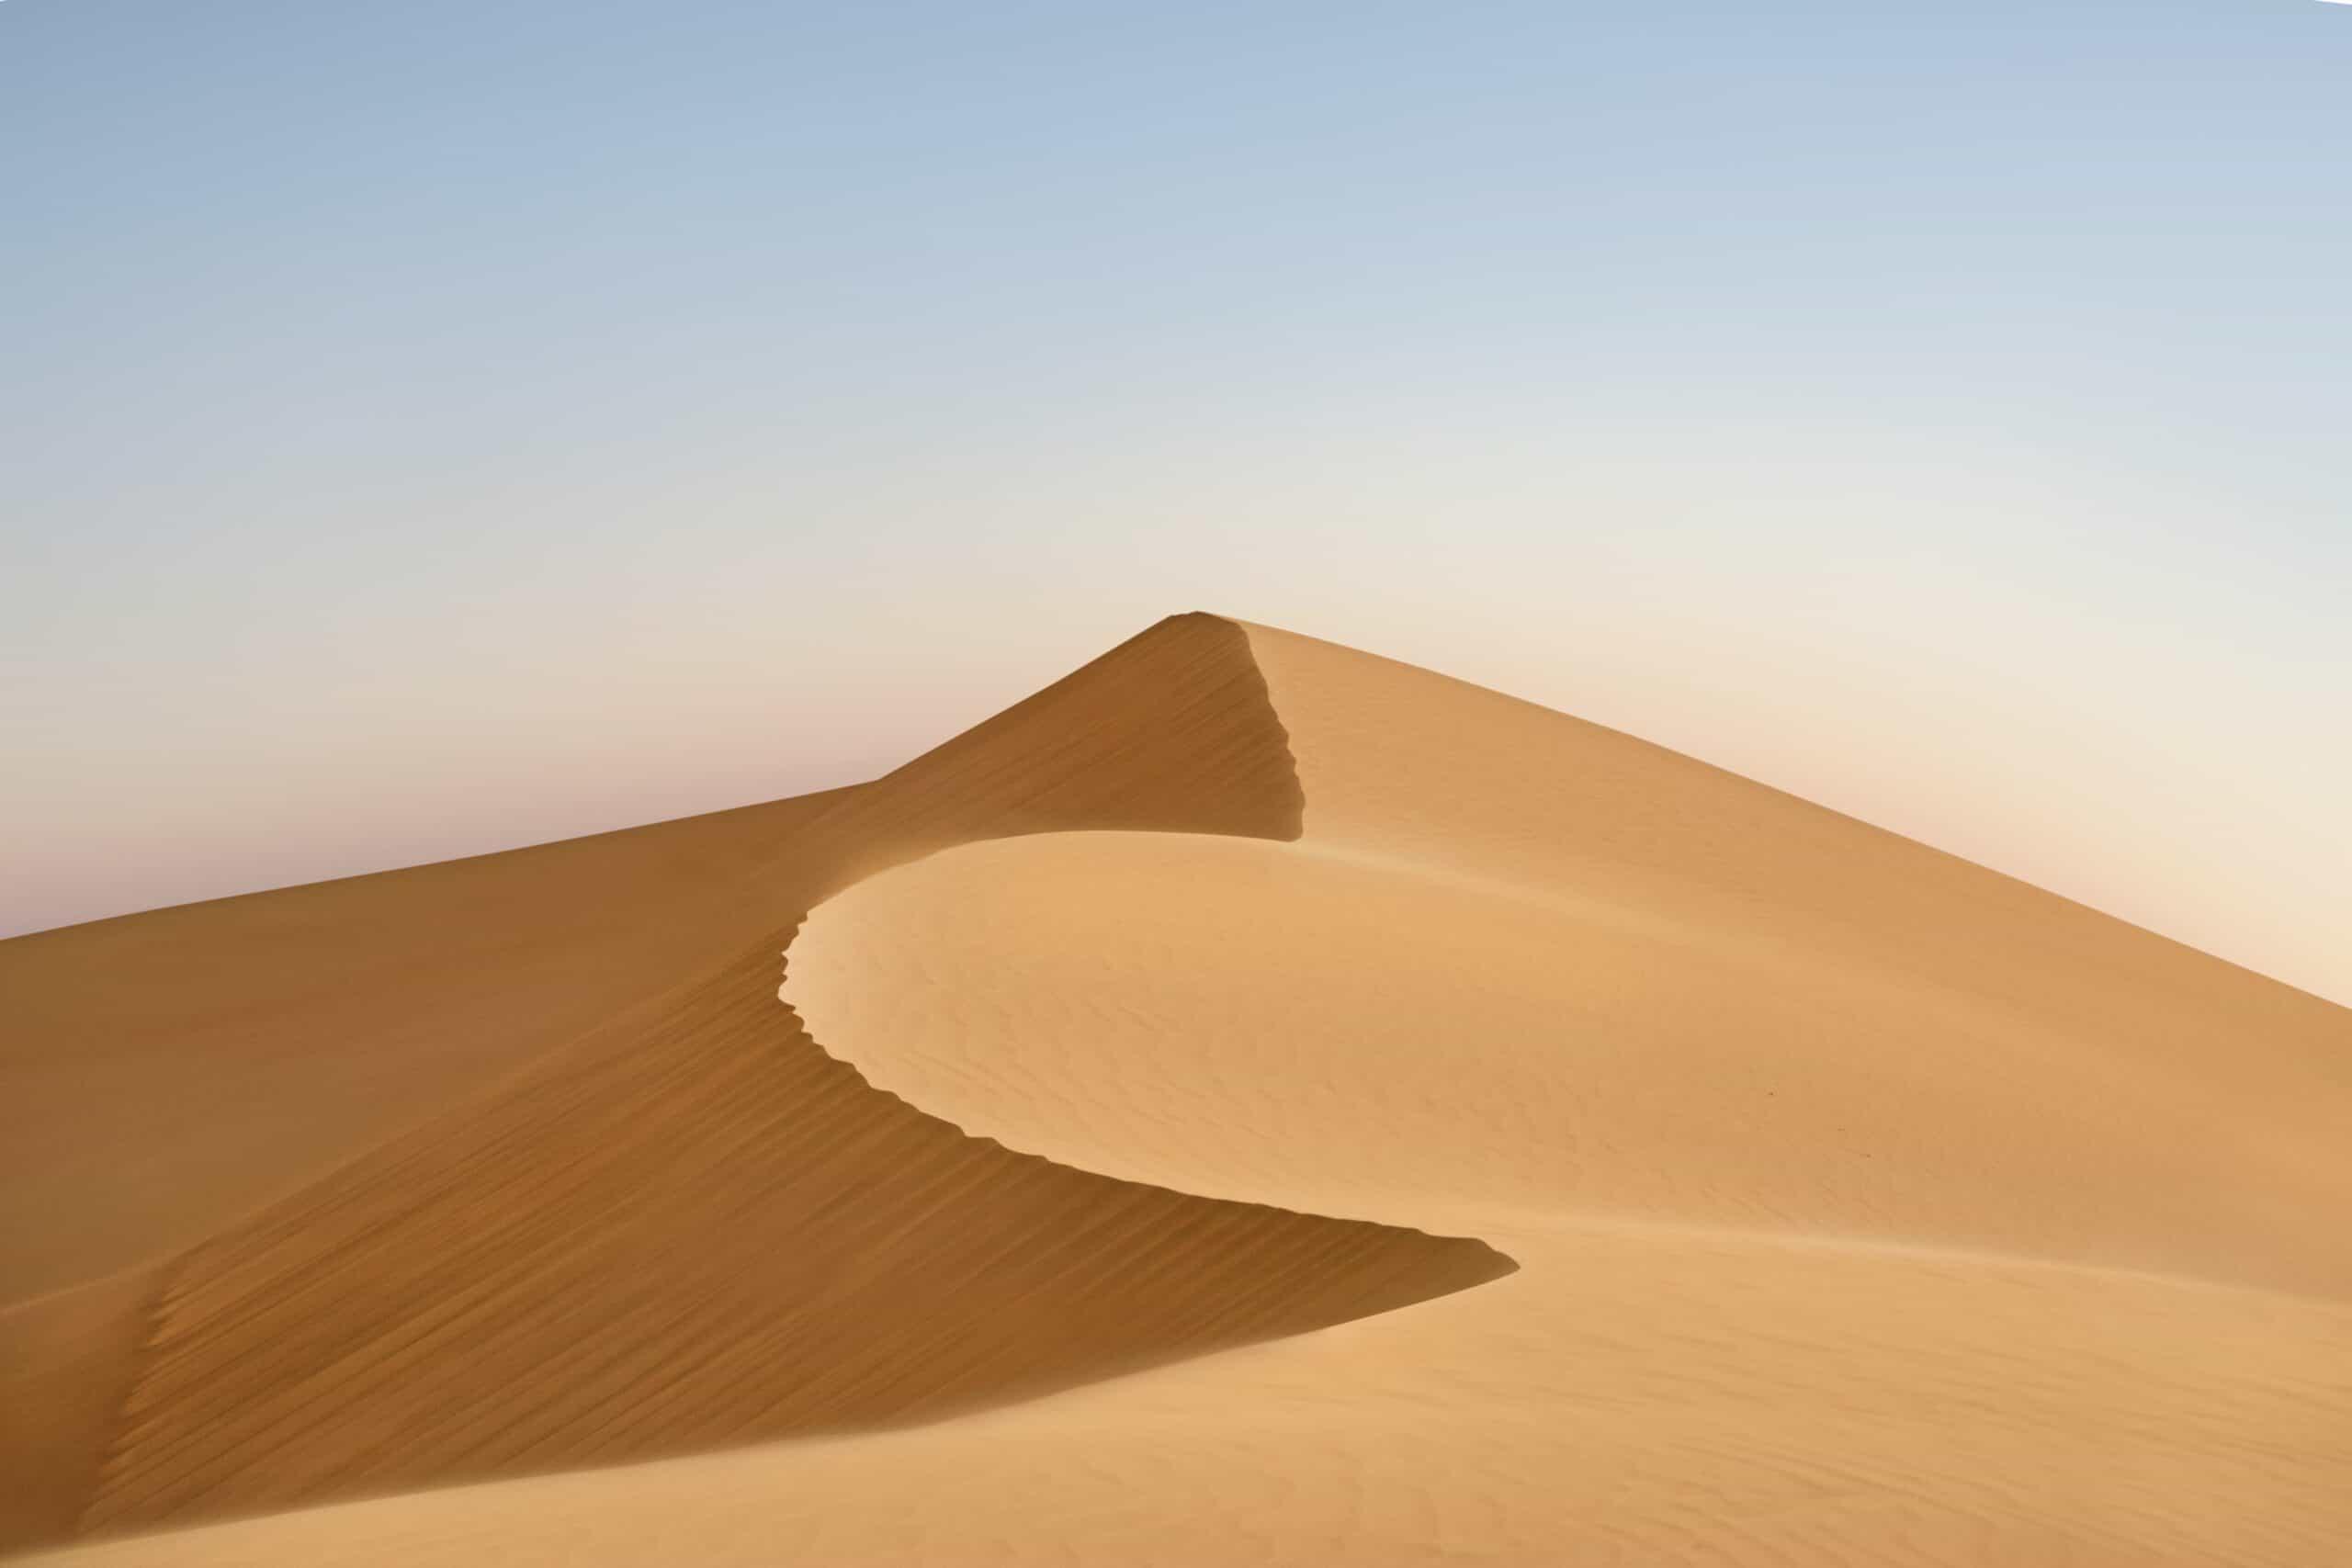 Sand Dune, Dubai, UAE